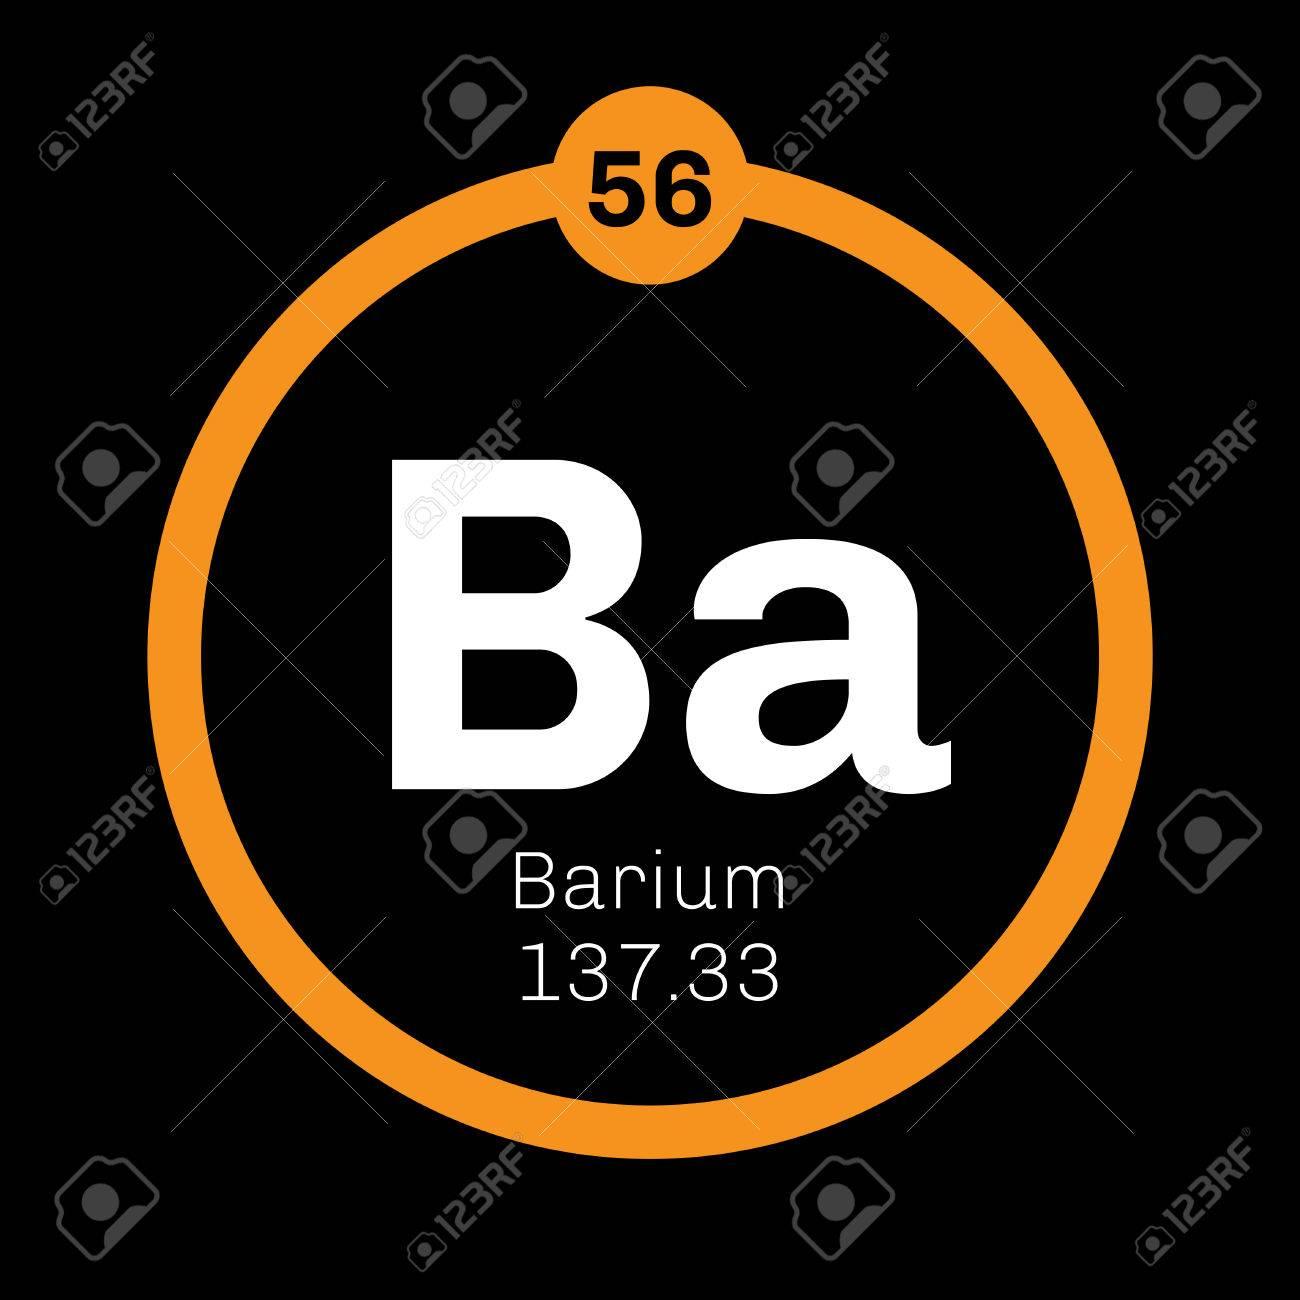 Barium chemical element an alkaline earth metal colored icon barium chemical element an alkaline earth metal colored icon with atomic number and atomic urtaz Gallery